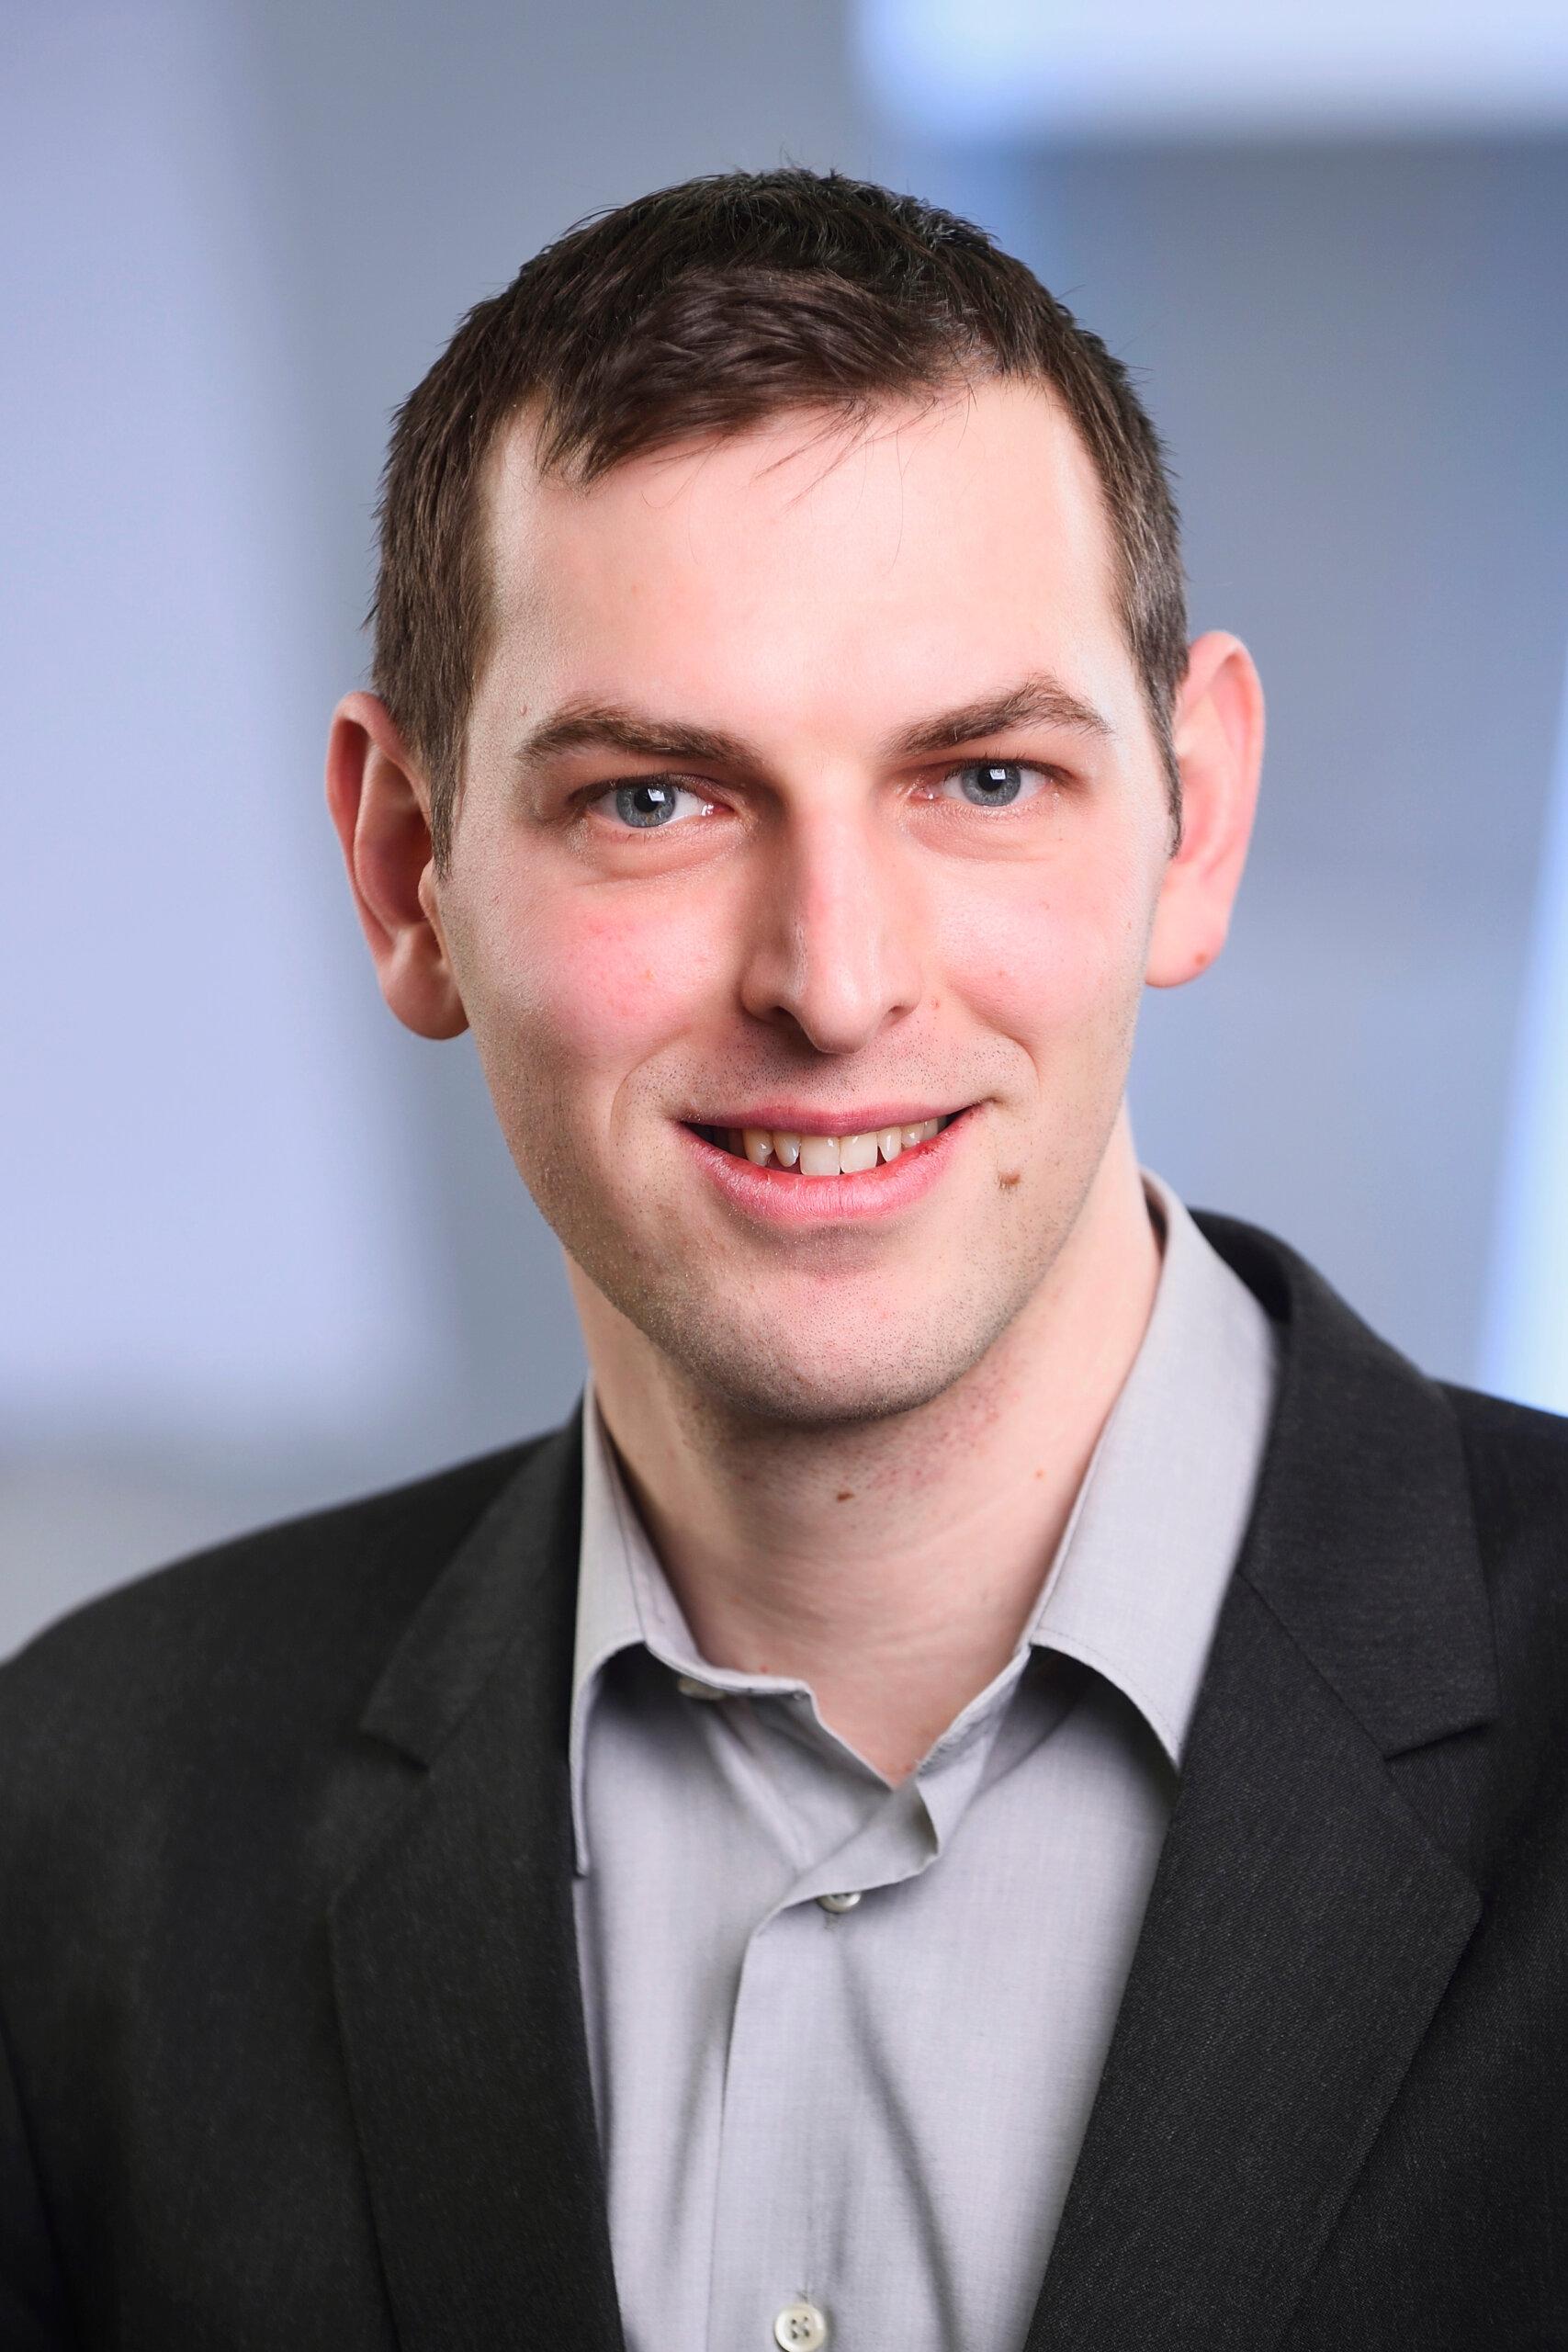 Michael Hartl Profilbild